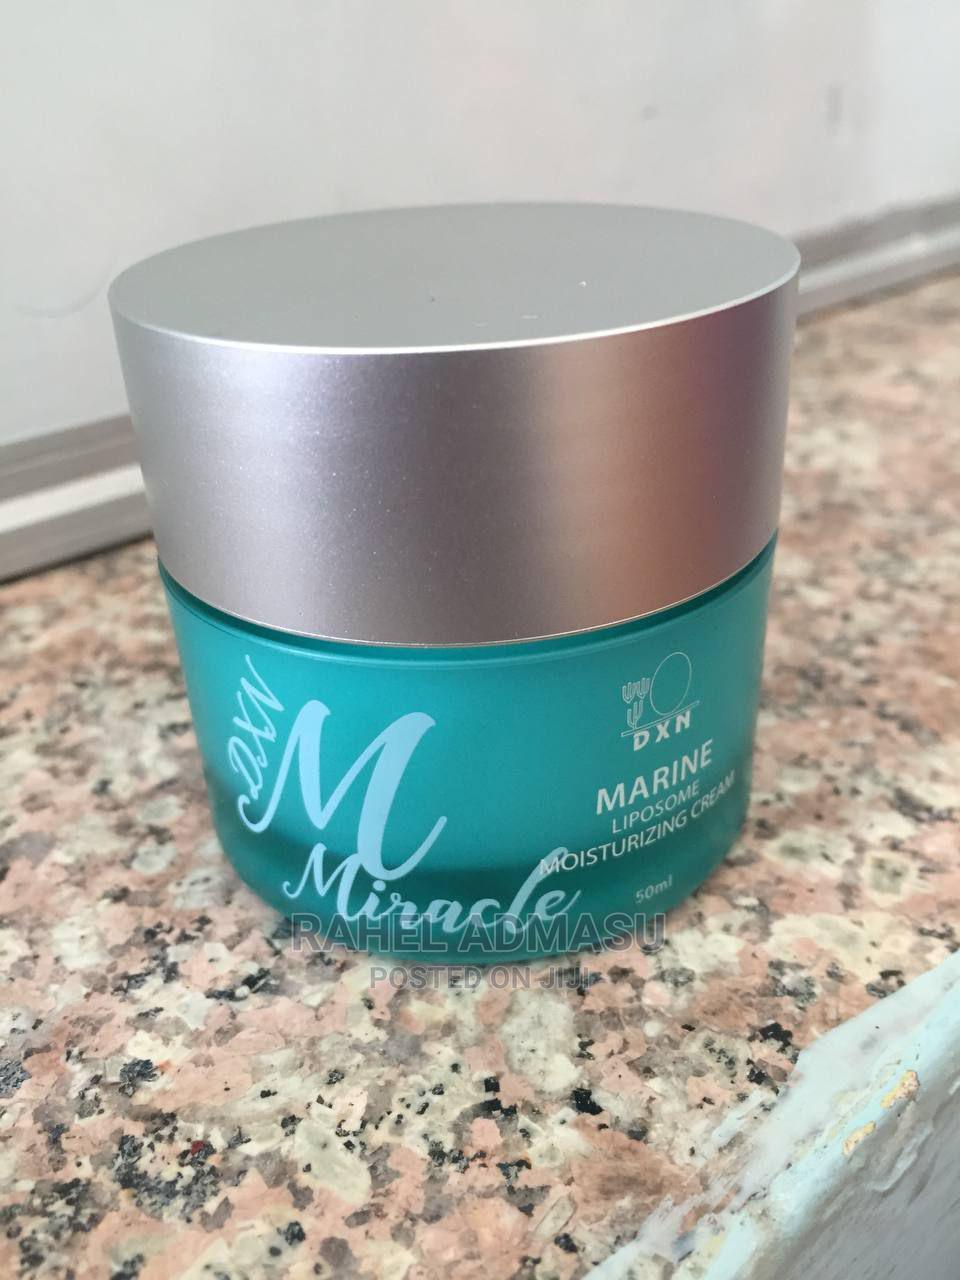 DXN Miracle Liposome Moisturizing Cream